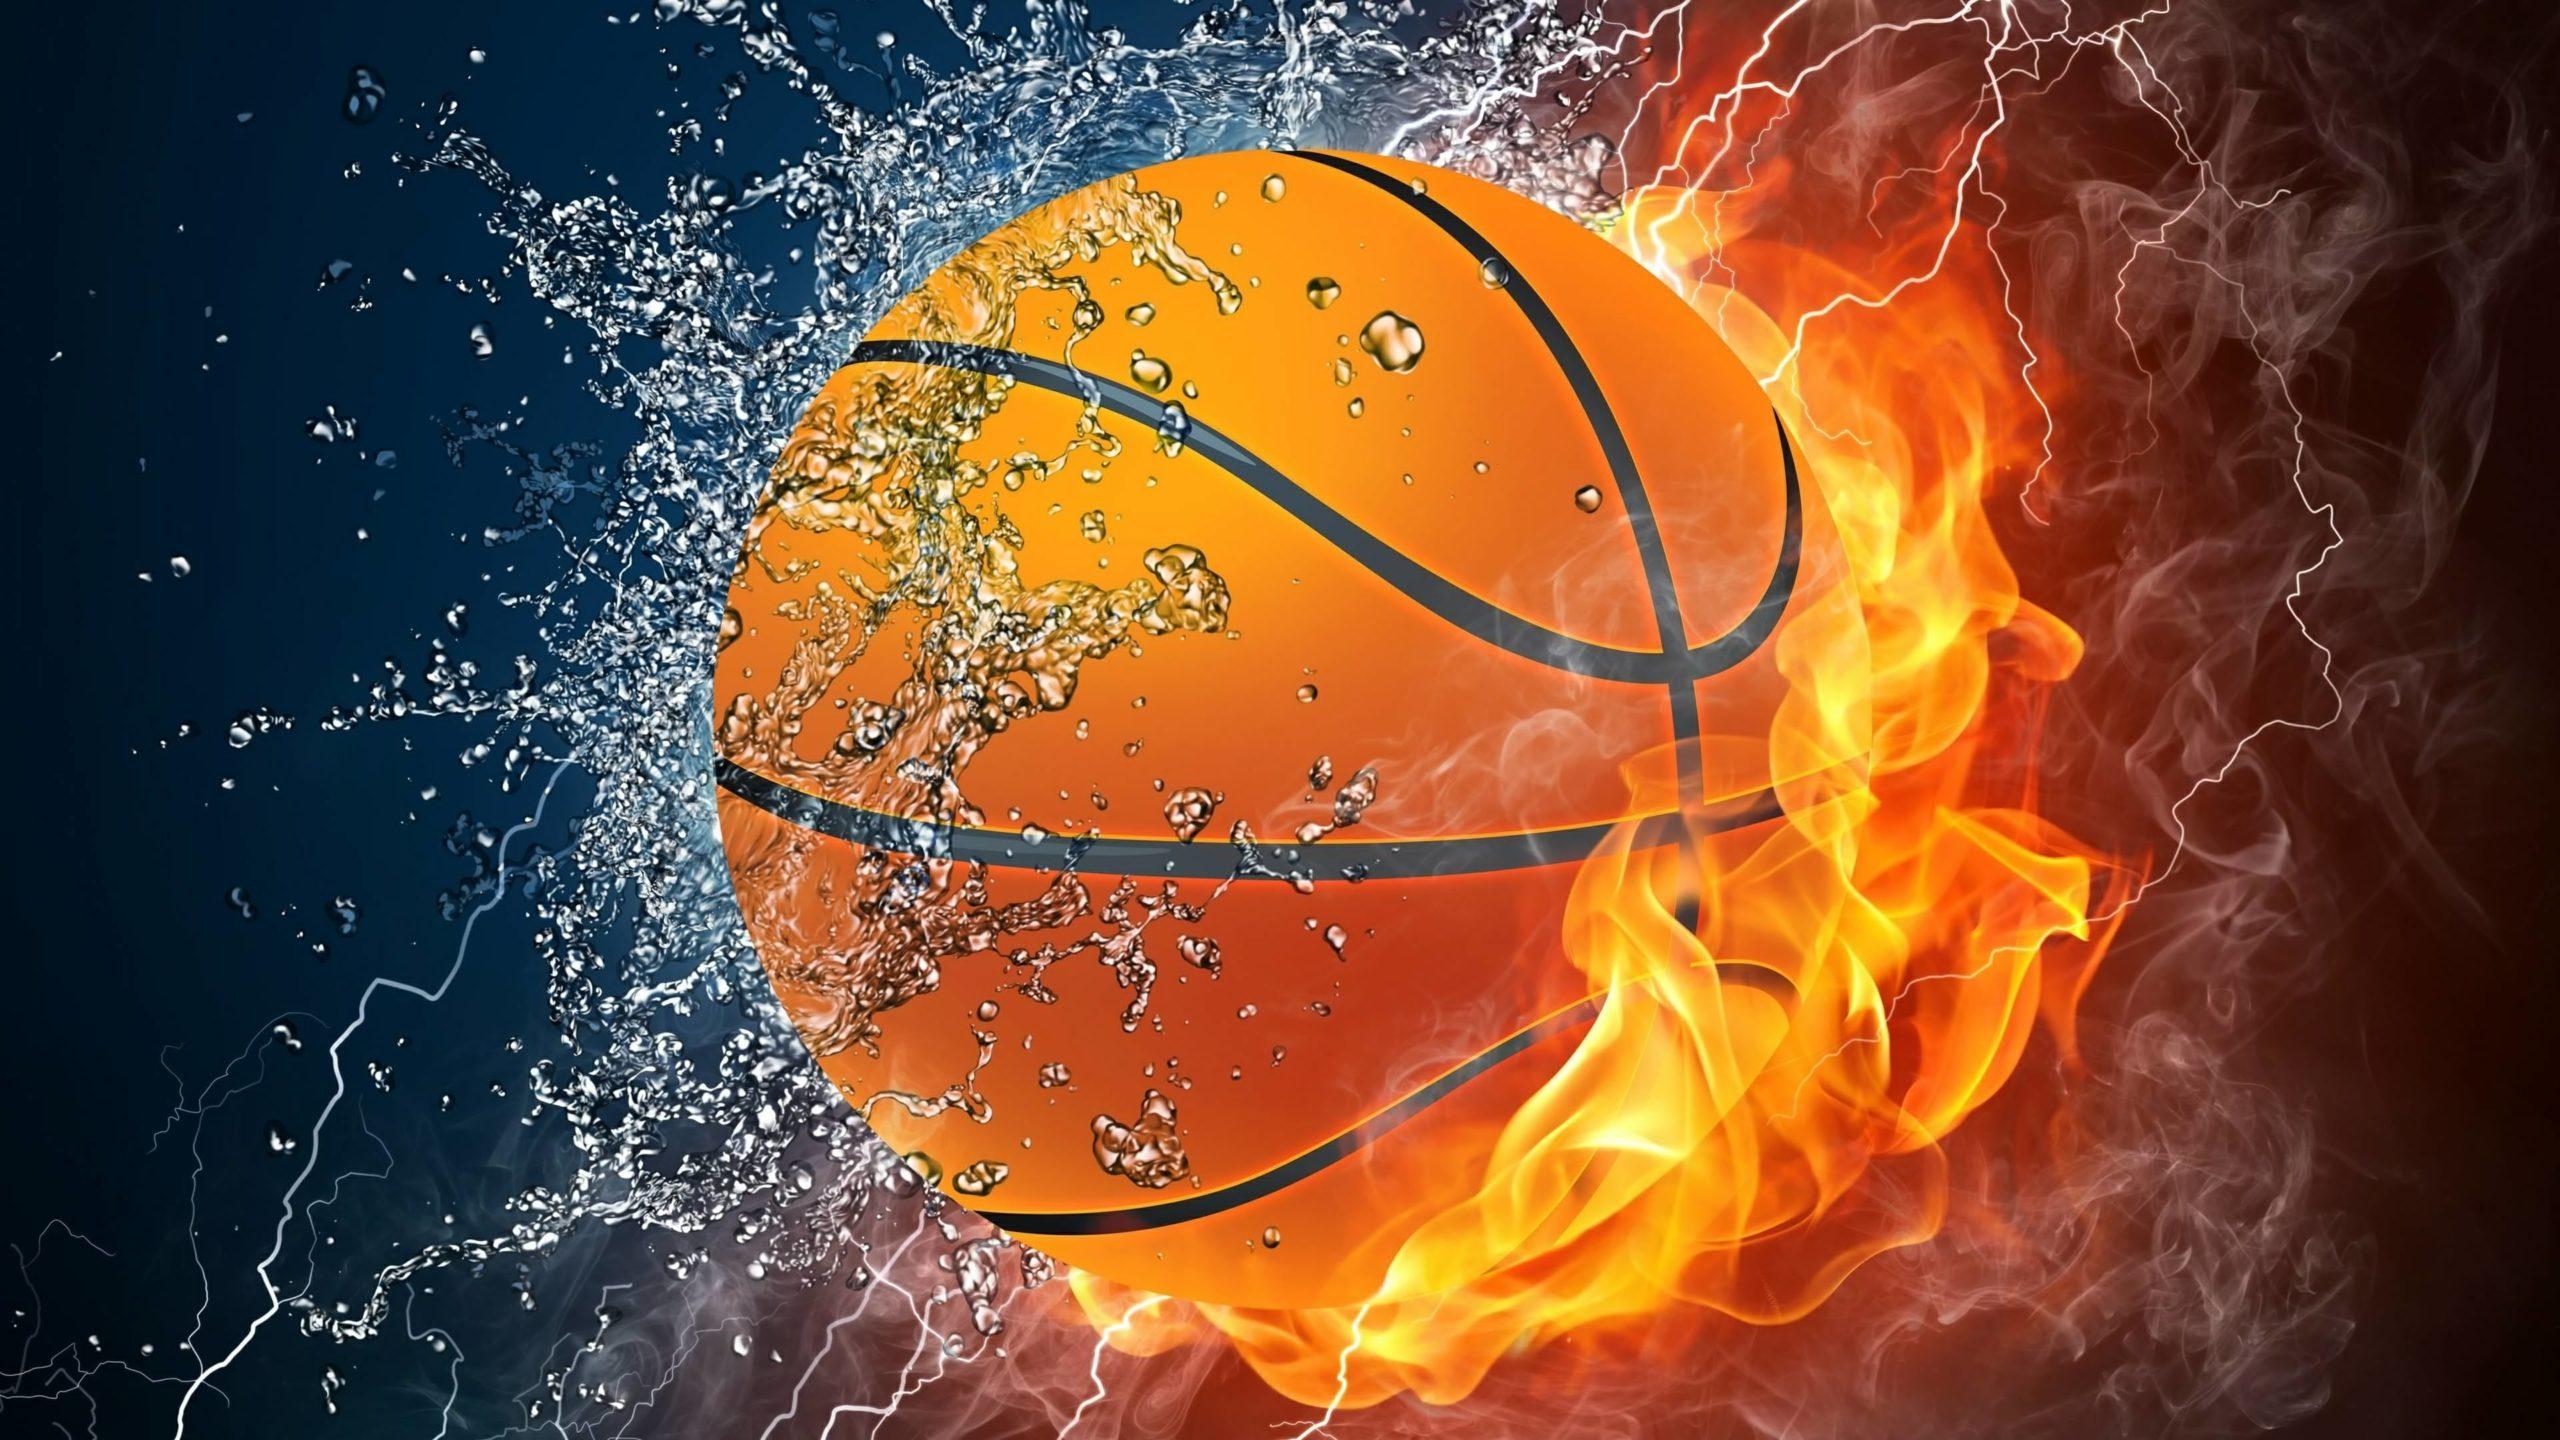 Basketball Wallpaper 4k free